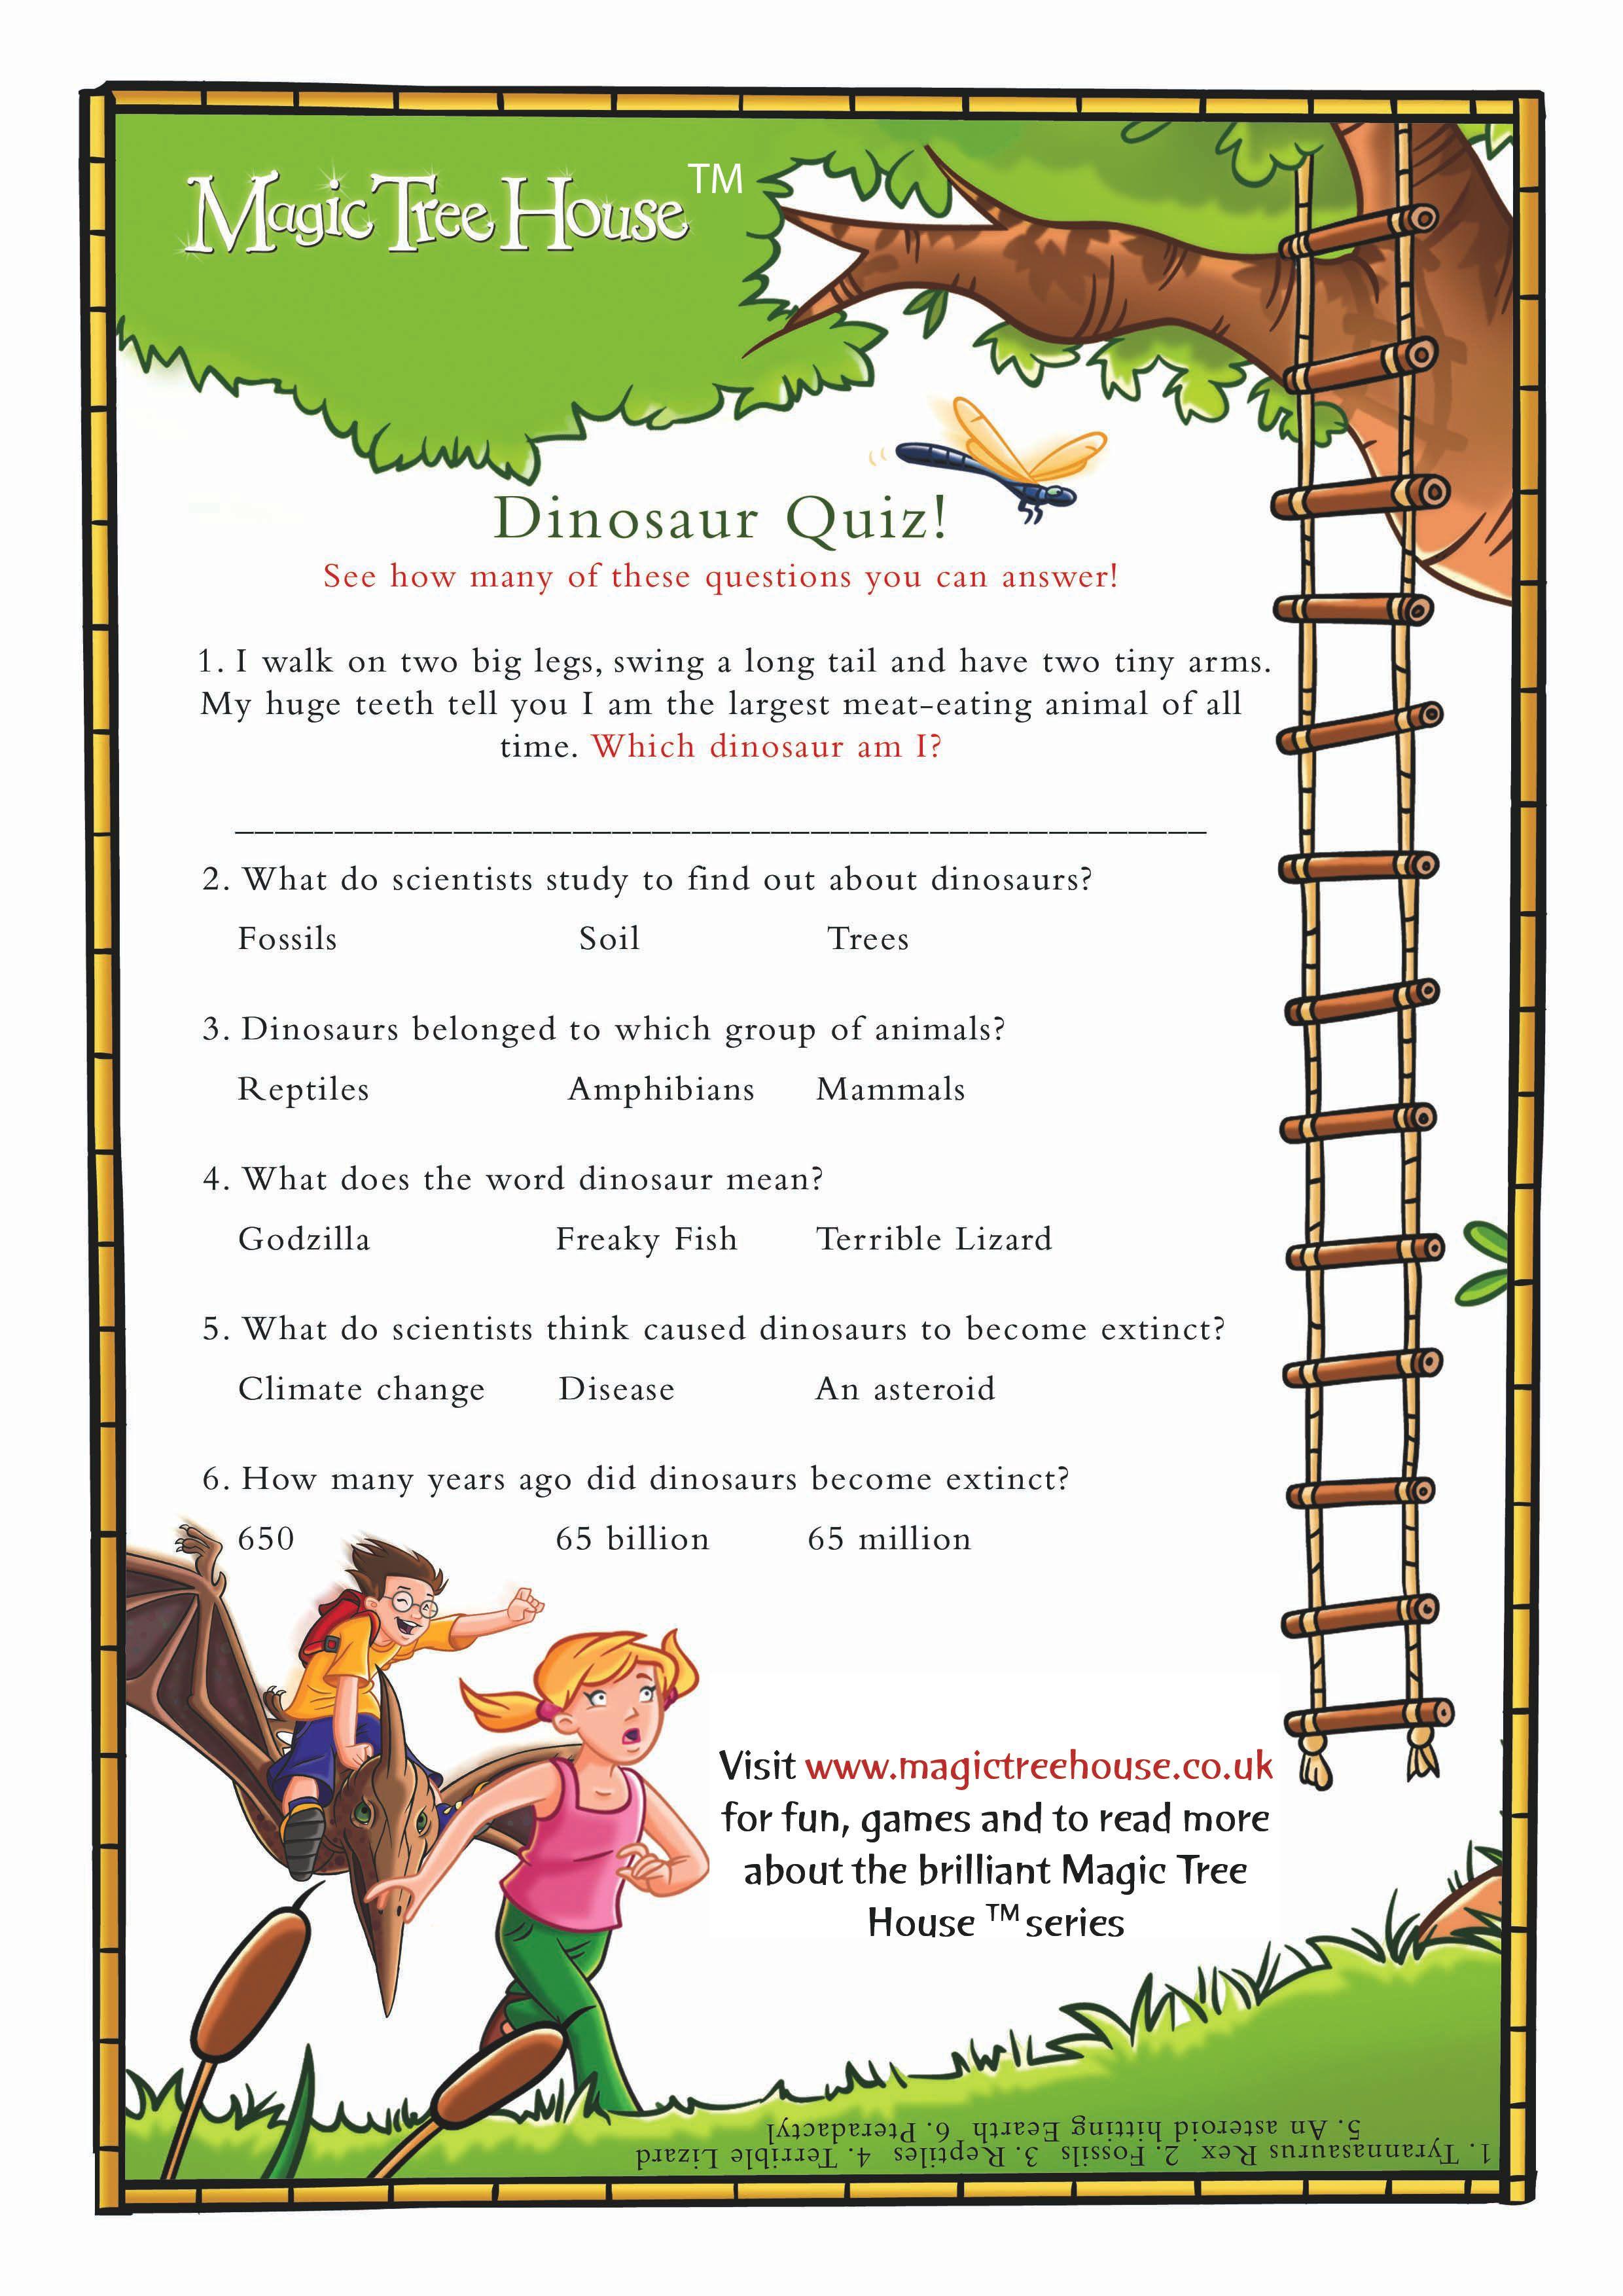 dinosaurs before dark davis 39 book club house quiz kids activity books magic treehouse. Black Bedroom Furniture Sets. Home Design Ideas